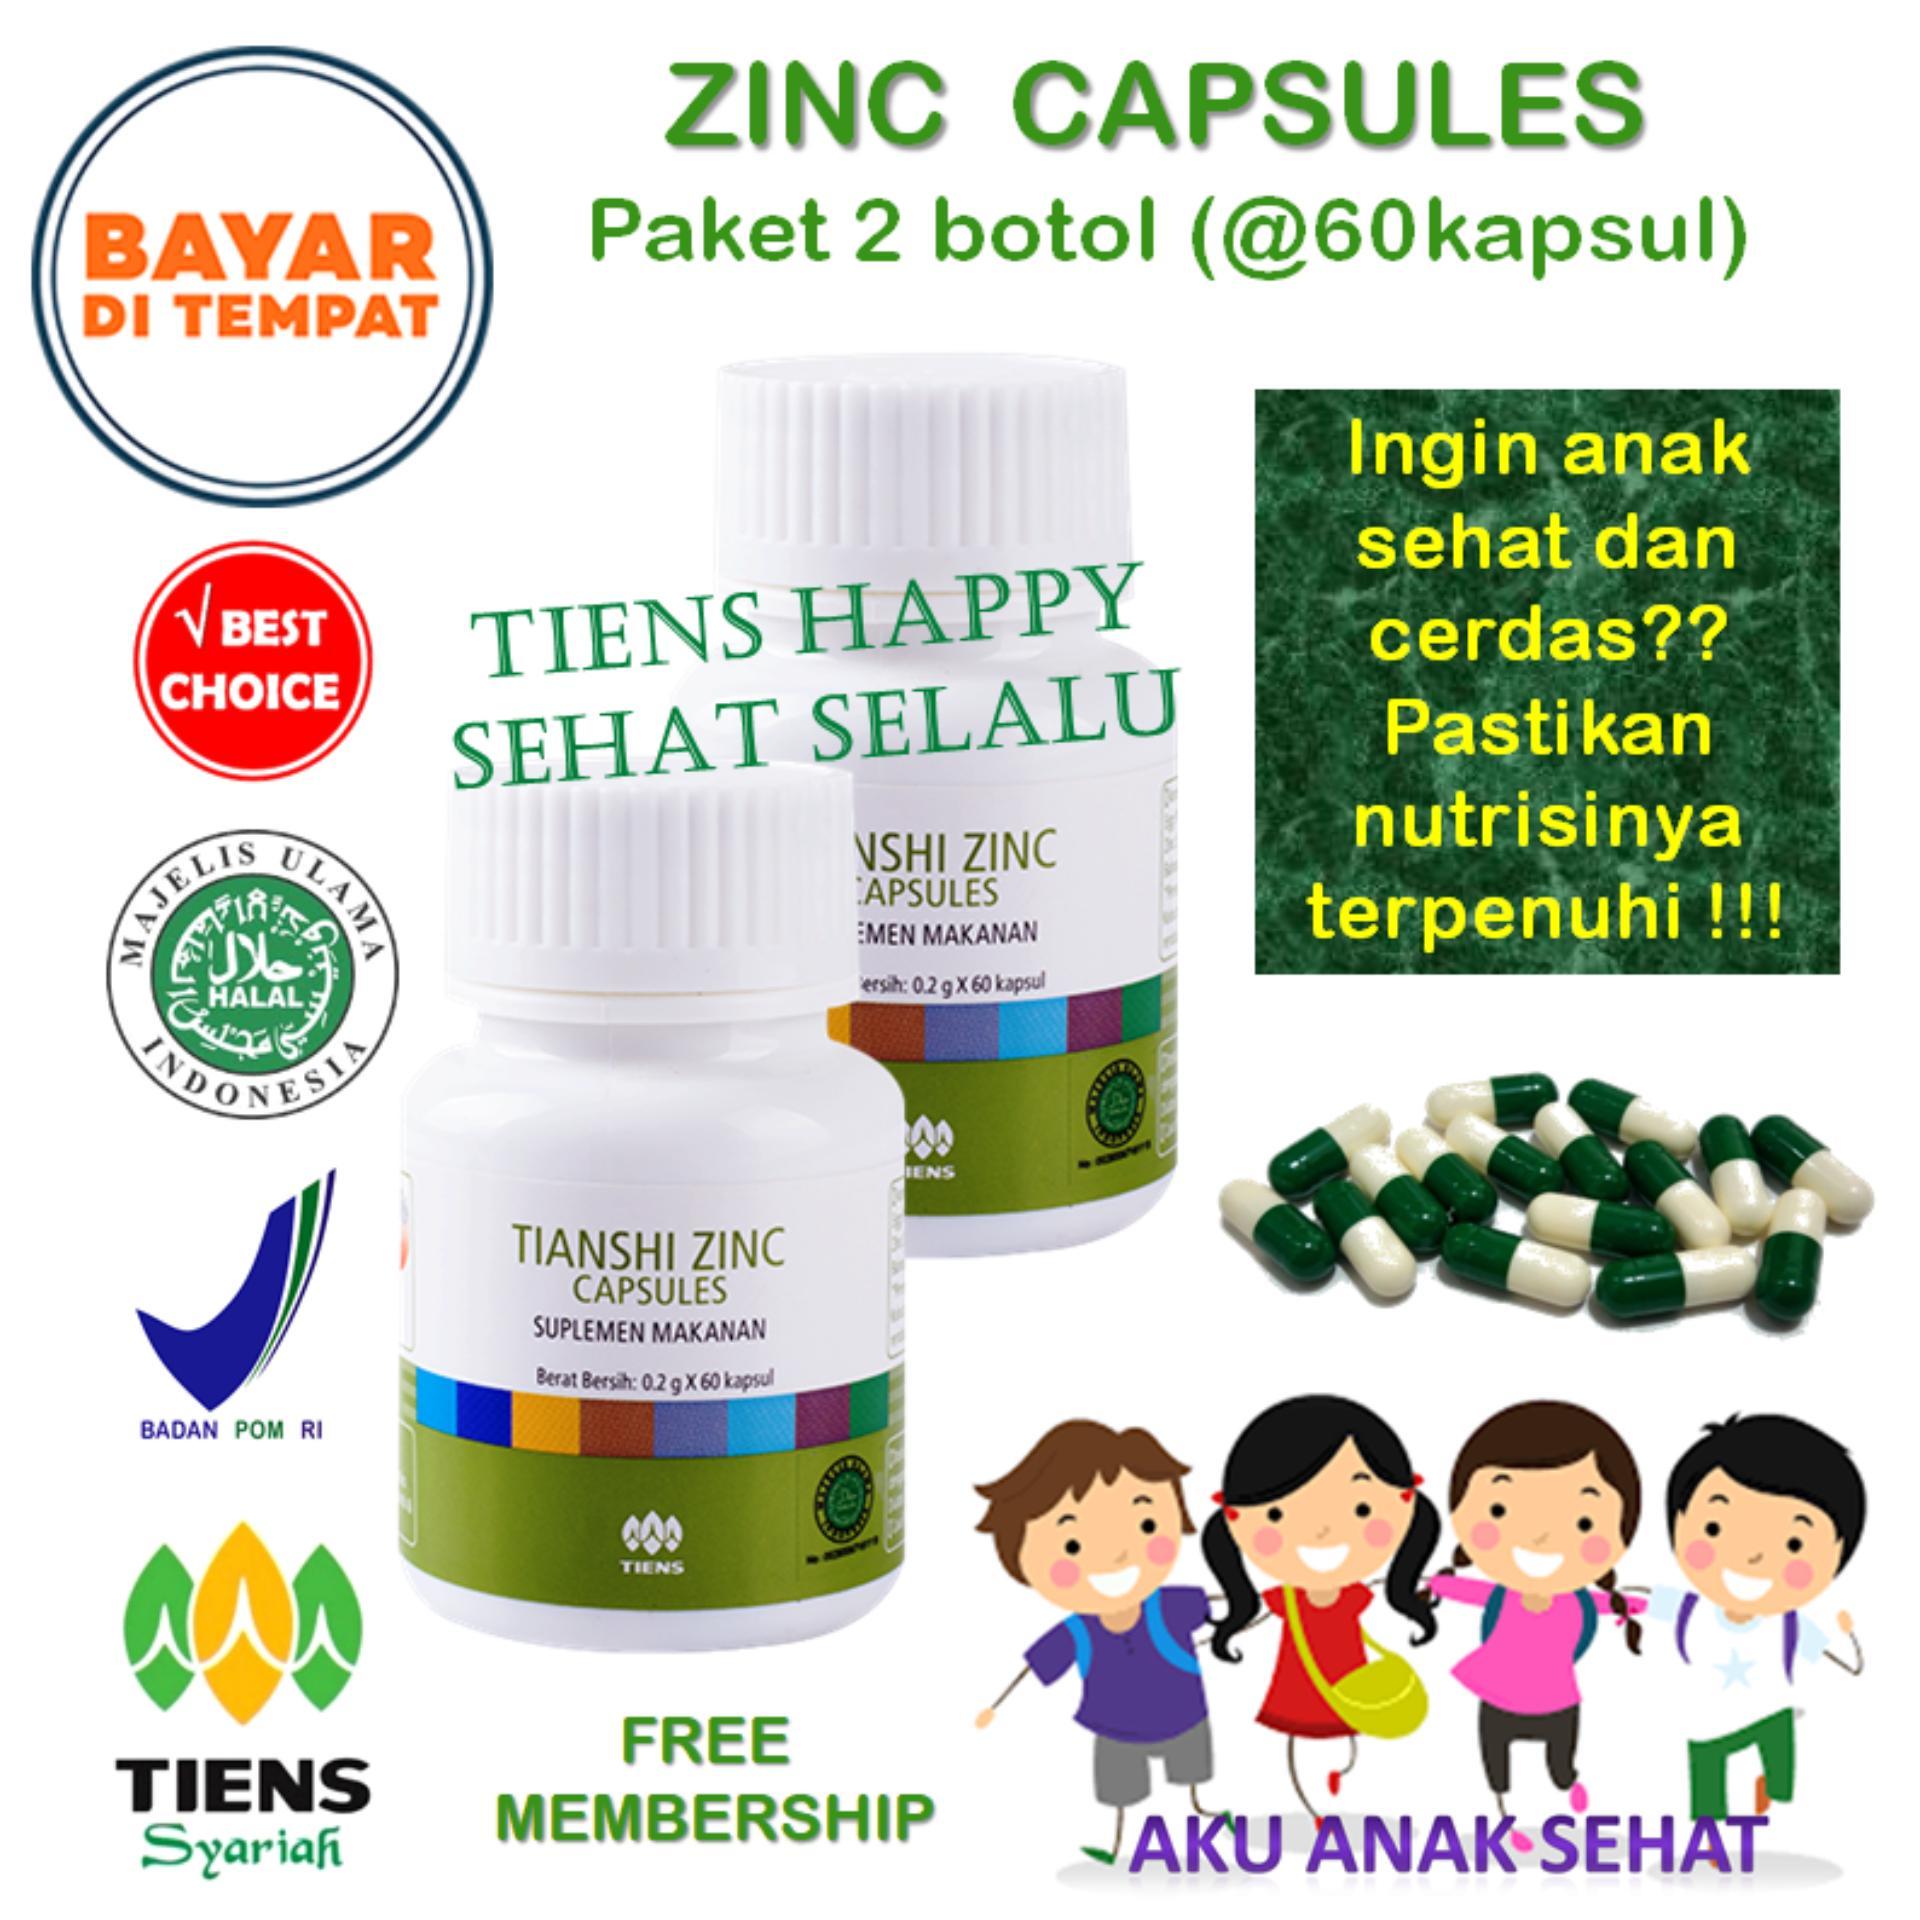 Toko Tiens Penggemuk Badan Herbal Paket Promo By Tiens Happy Sehat Selalu Termurah